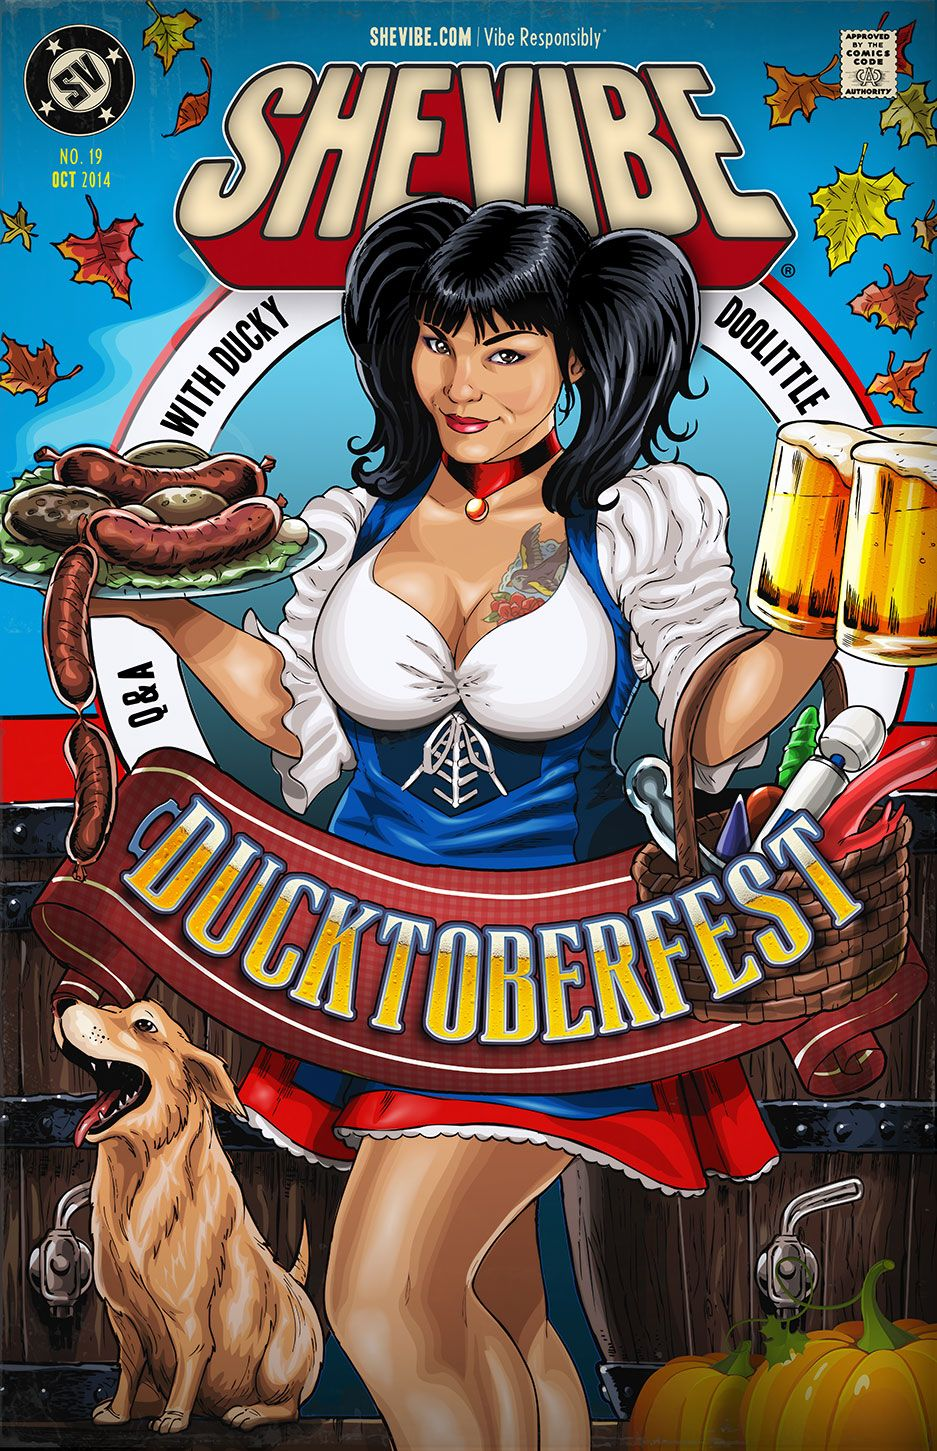 Is that a Bratwurst In Your Pocket Or Is It Ducktoberfest? SheVibe Presents Ducky DooLittle! #duckydoolittle #ducktoberfest #octoberfest